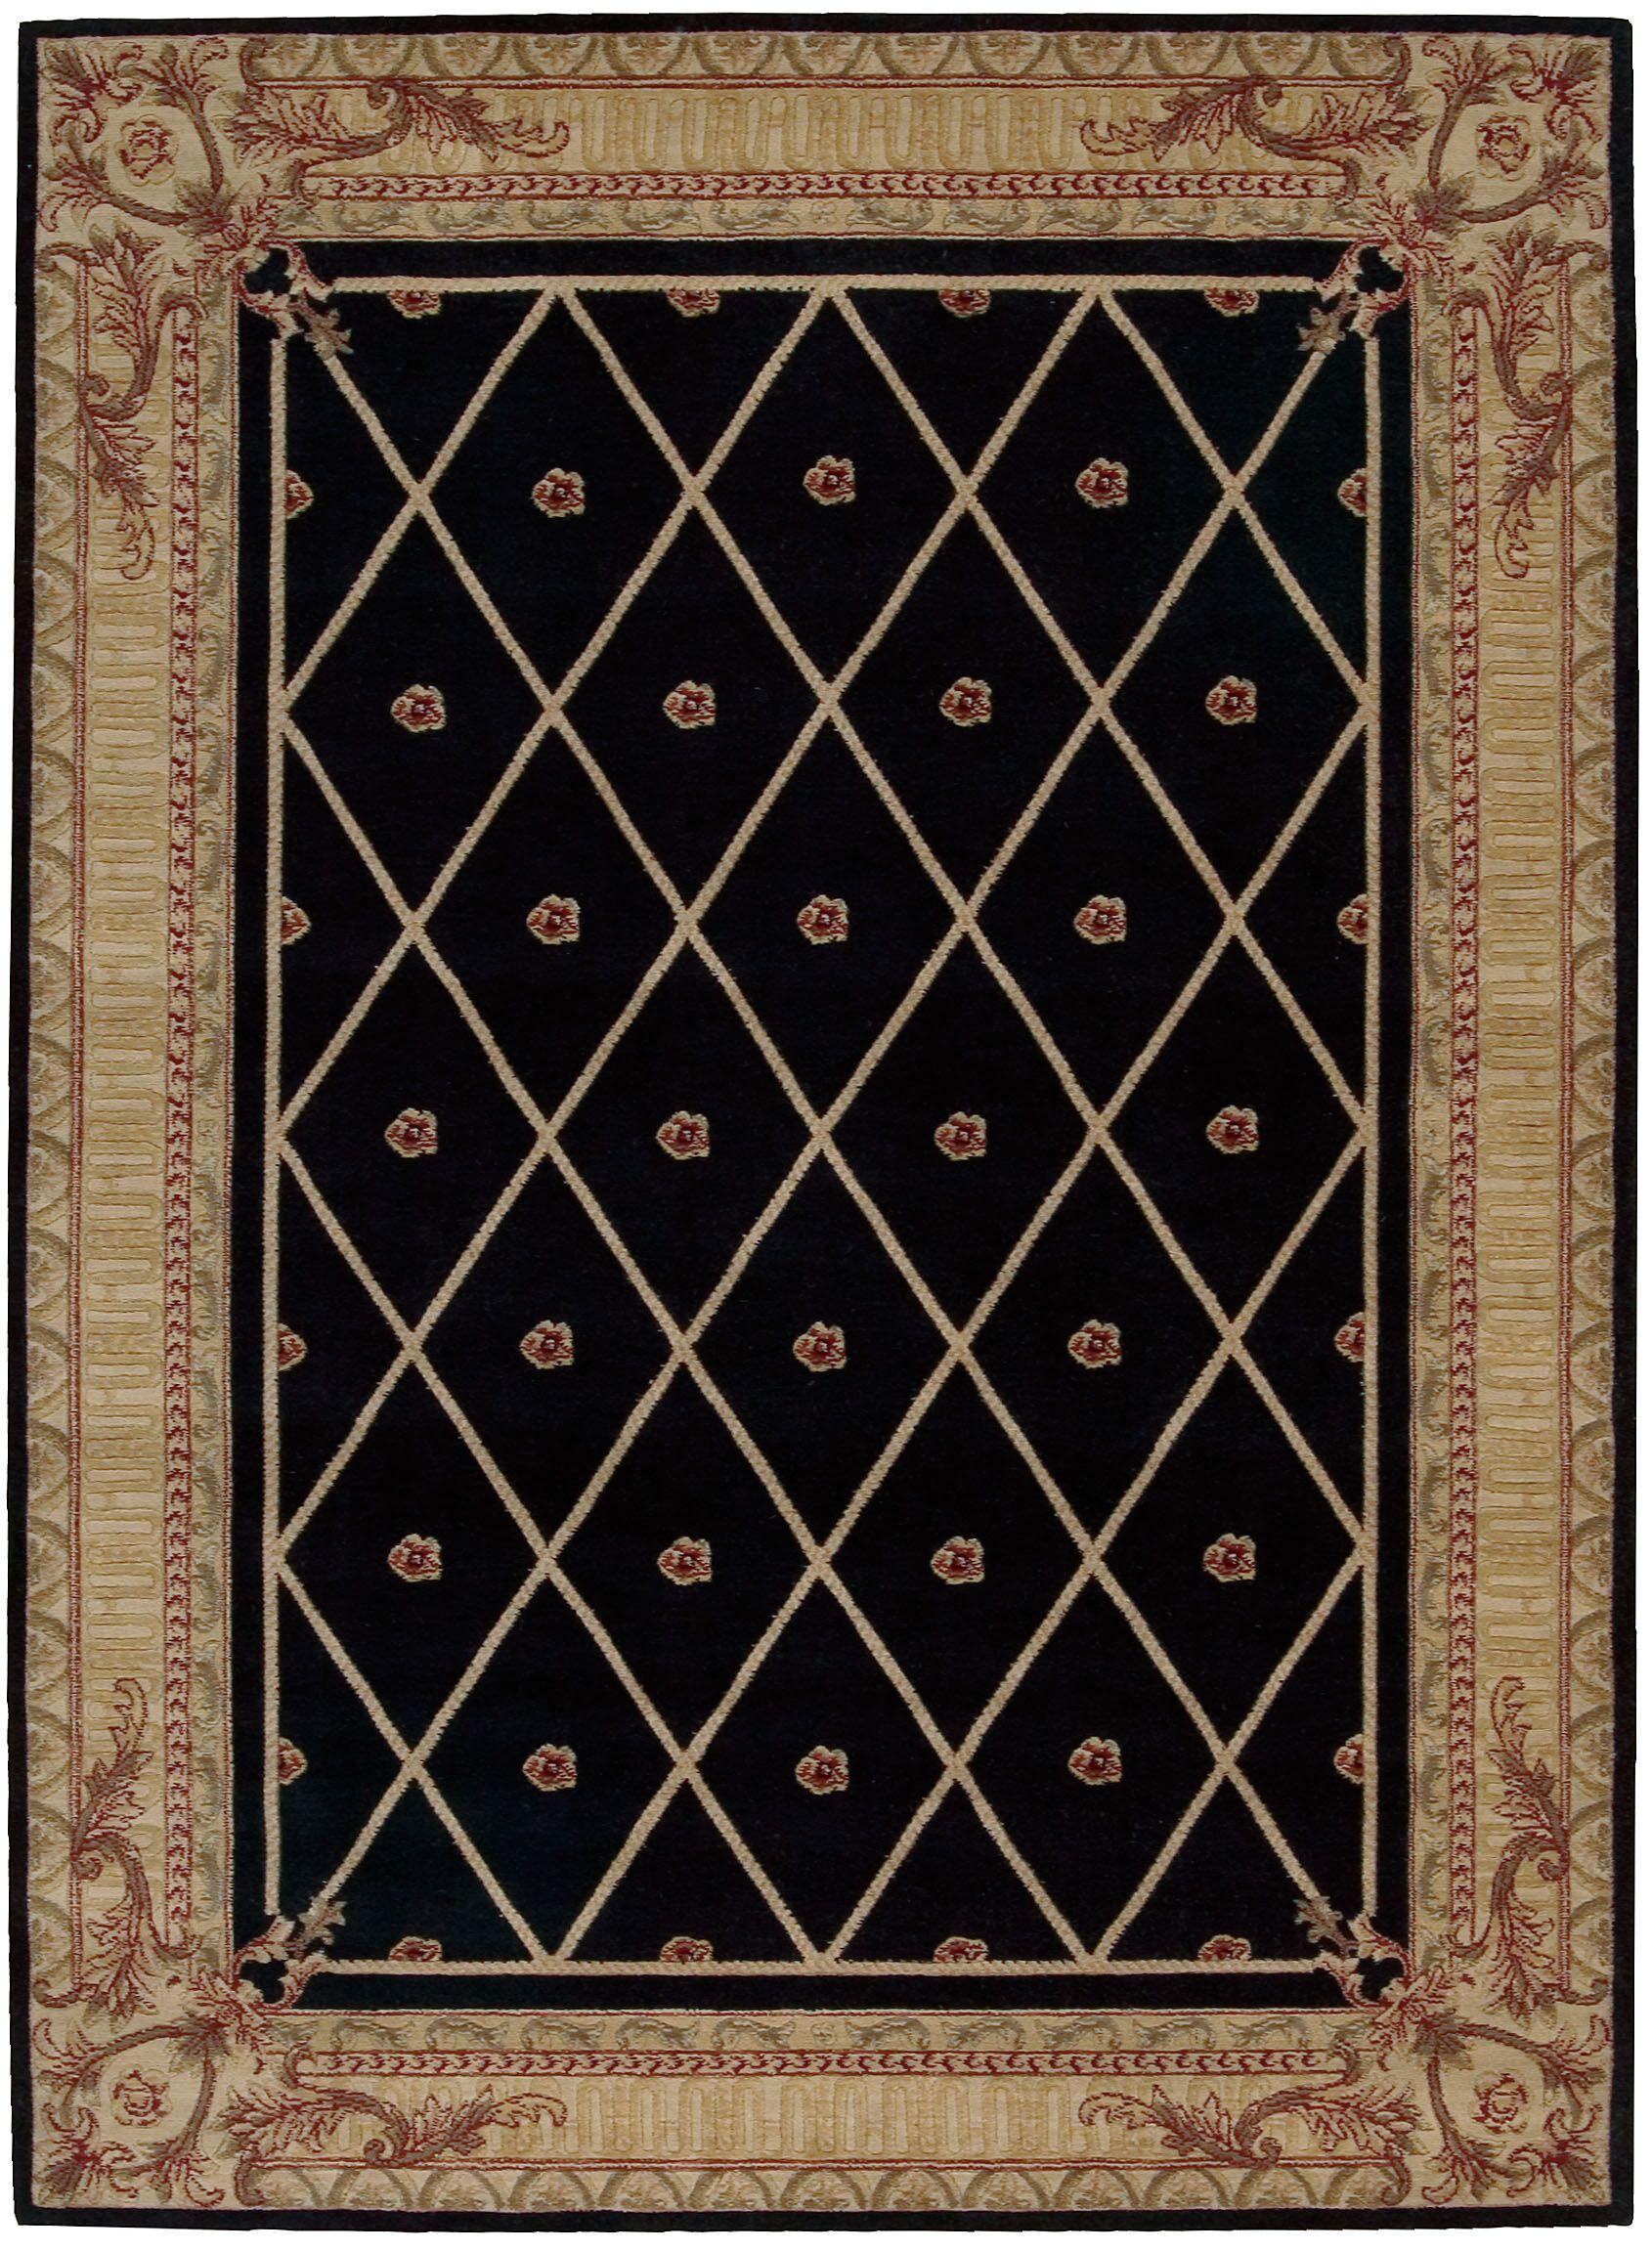 Payzley Black Area Rug Rug Size: Rectangle 2' x 5'9